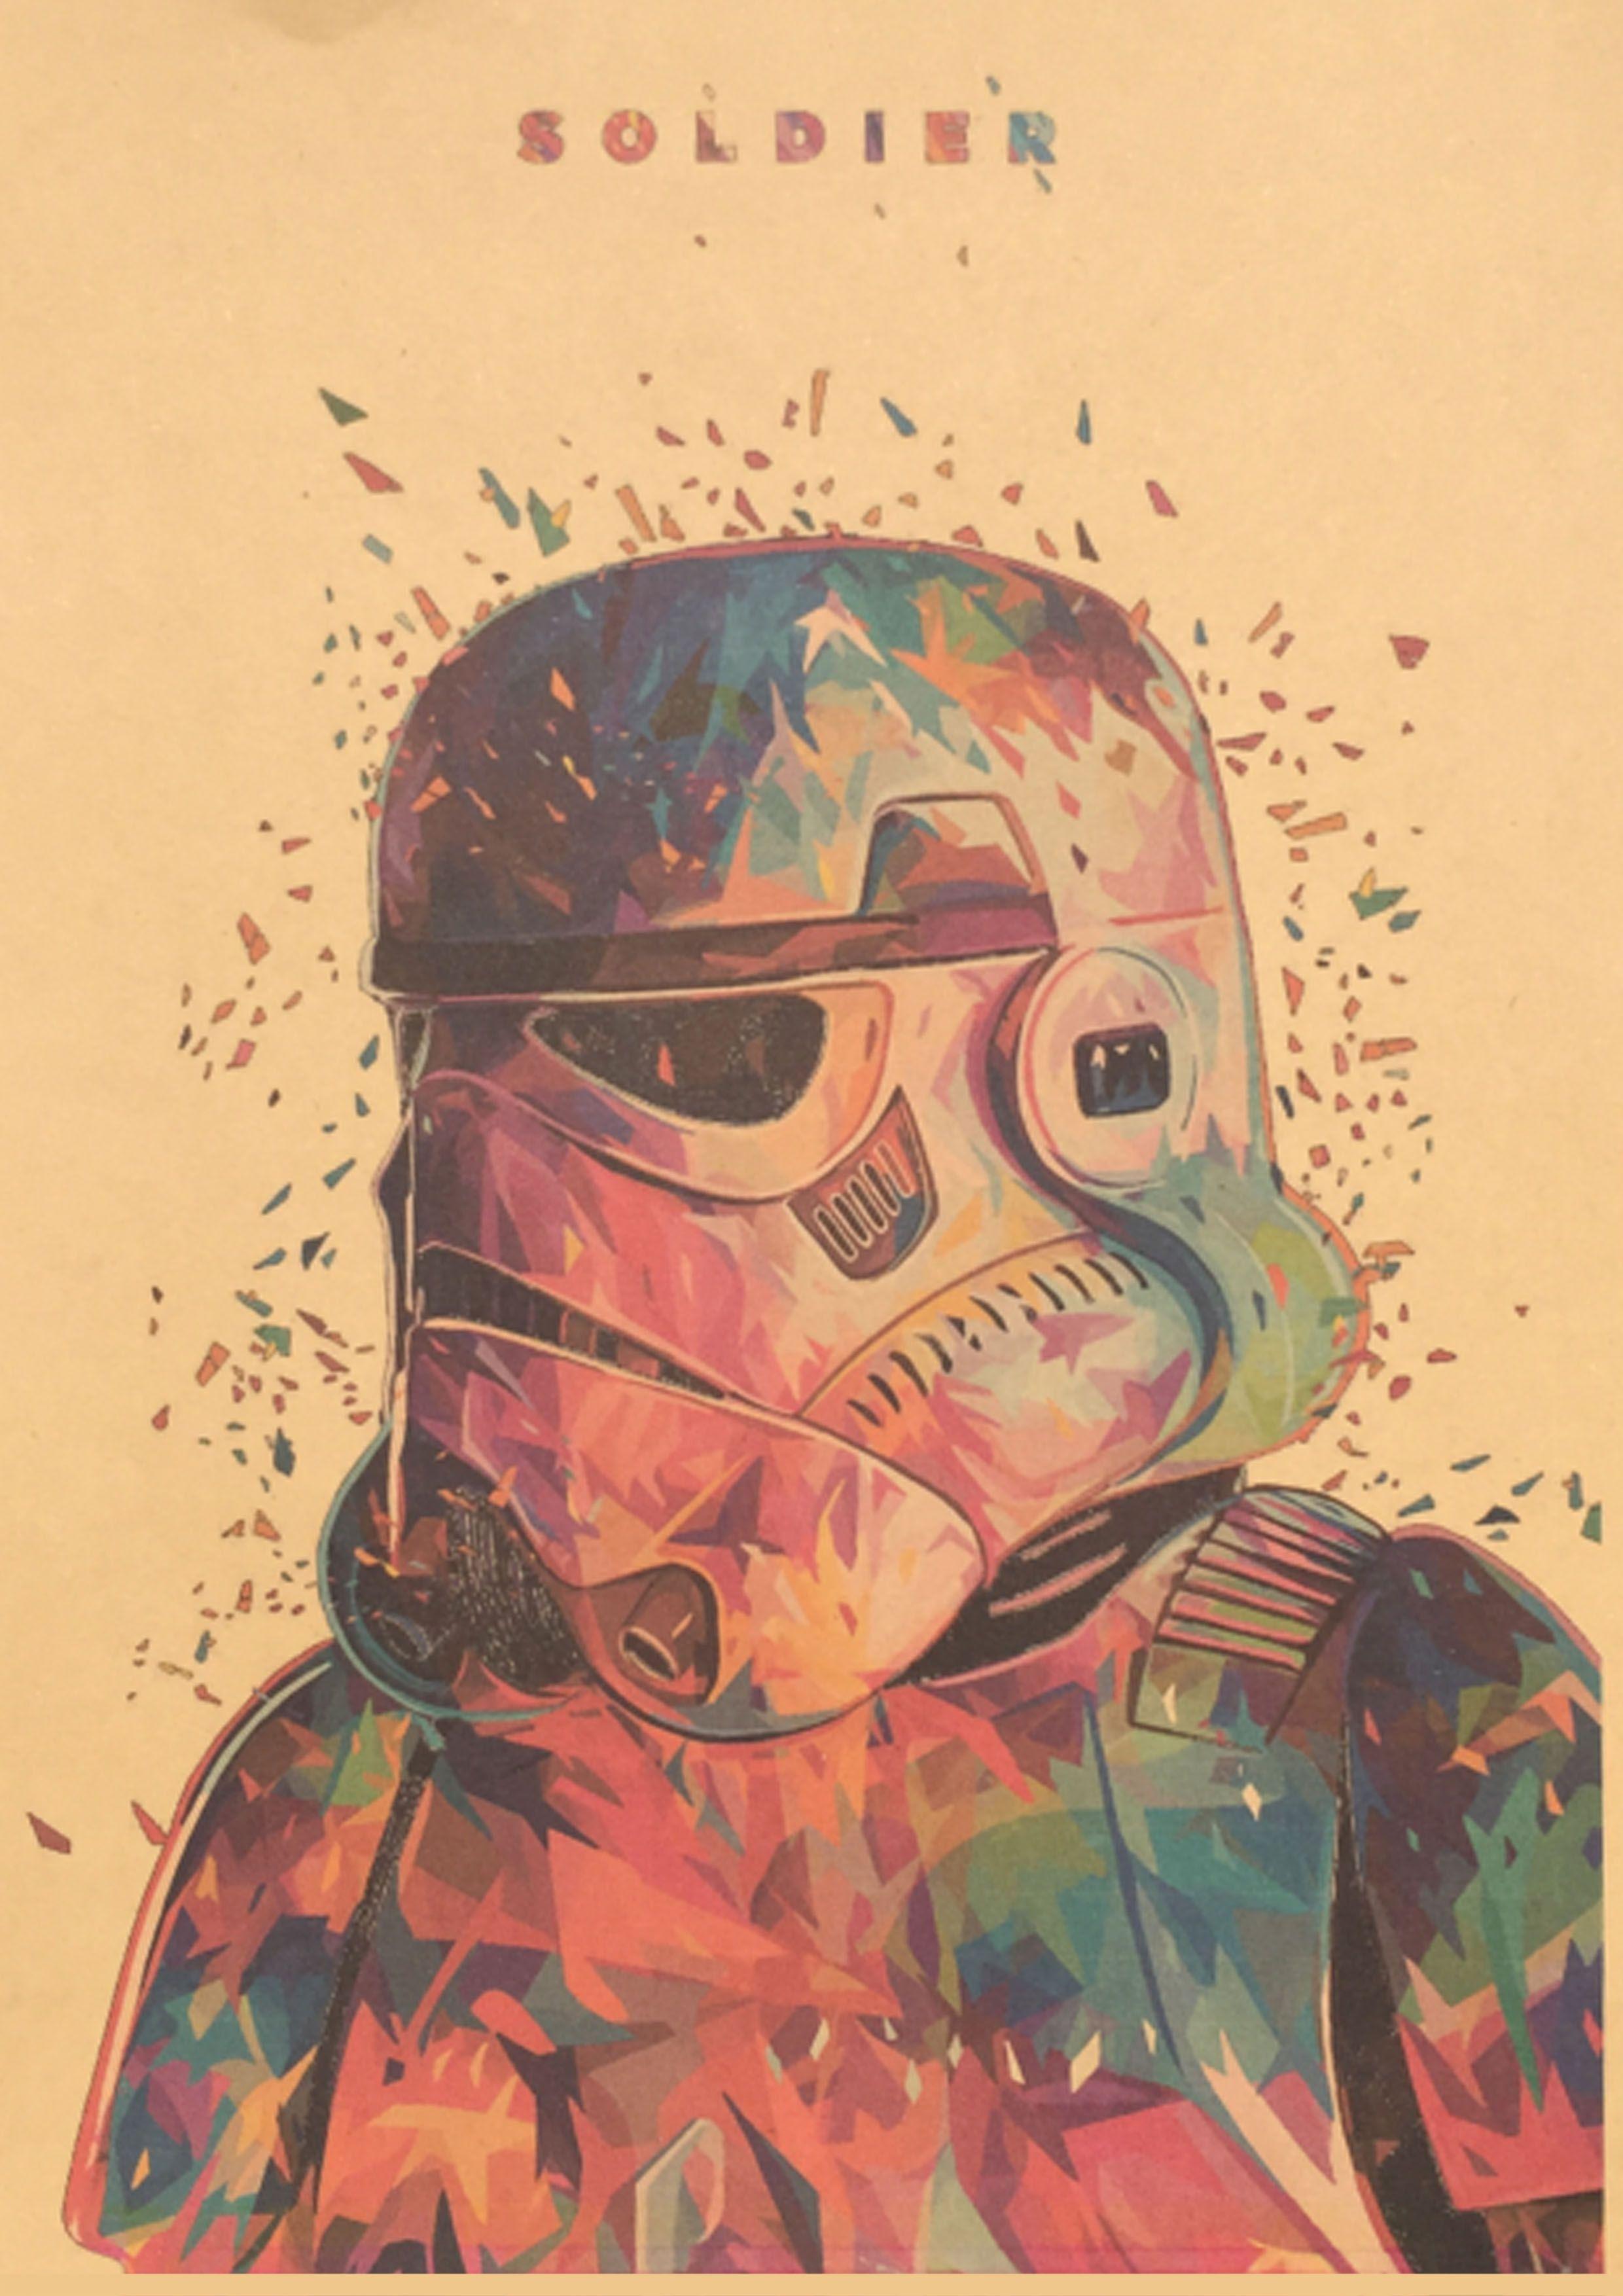 Vintage Star Wars Wallpaper 2480x3508 Download Hd Wallpaper Wallpapertip